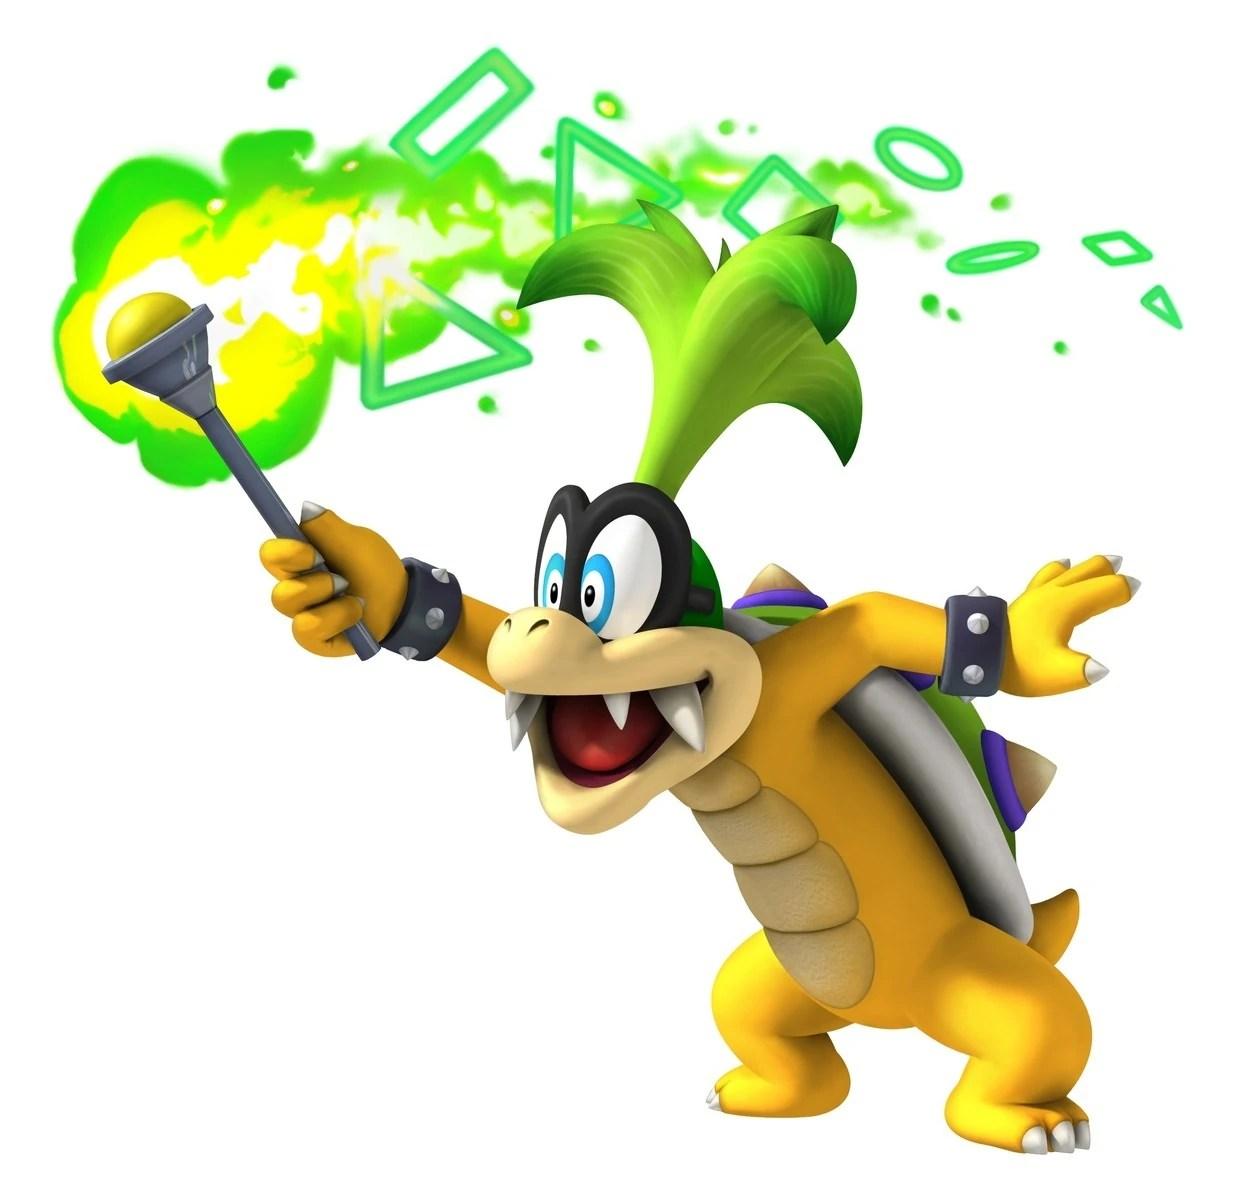 Image Iggy Koopa 3Djpg Fantendo Nintendo Fanon Wiki